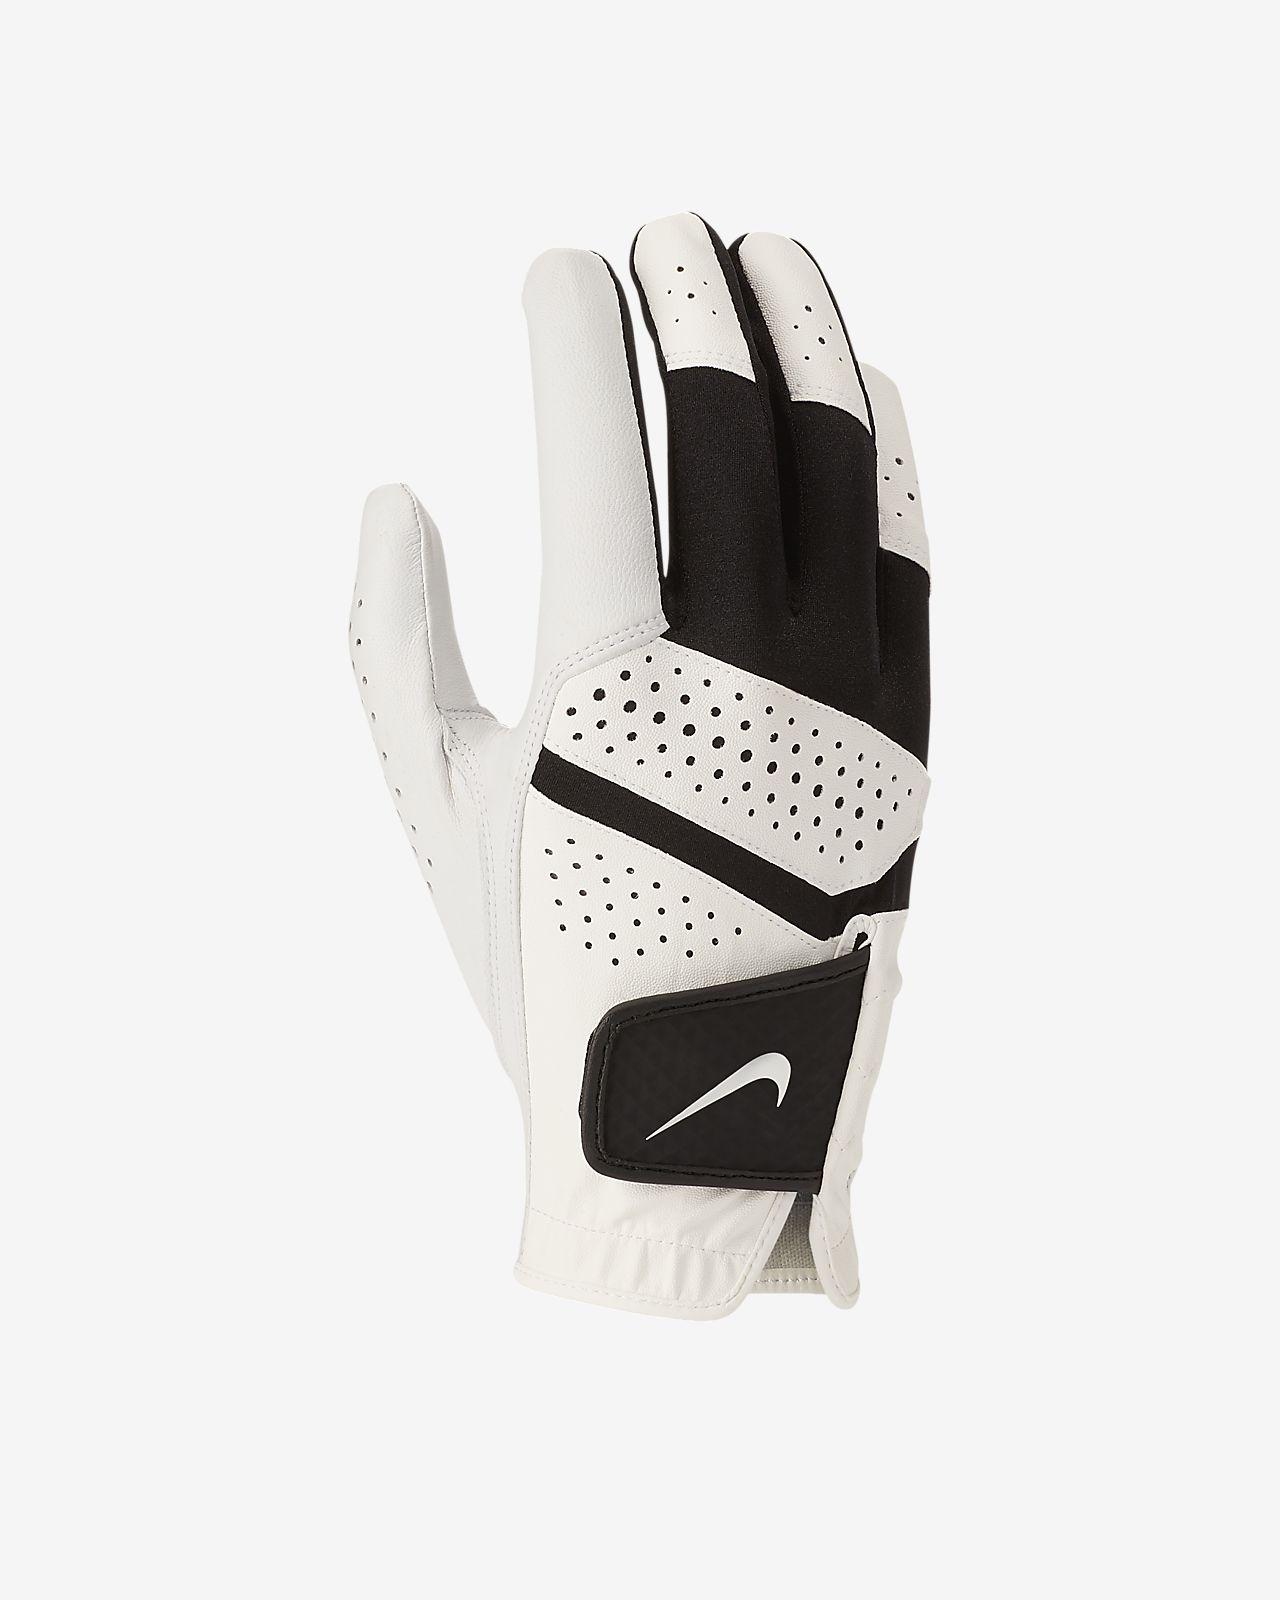 Nike Tech Extreme VI Golf Glove (Right Regular)